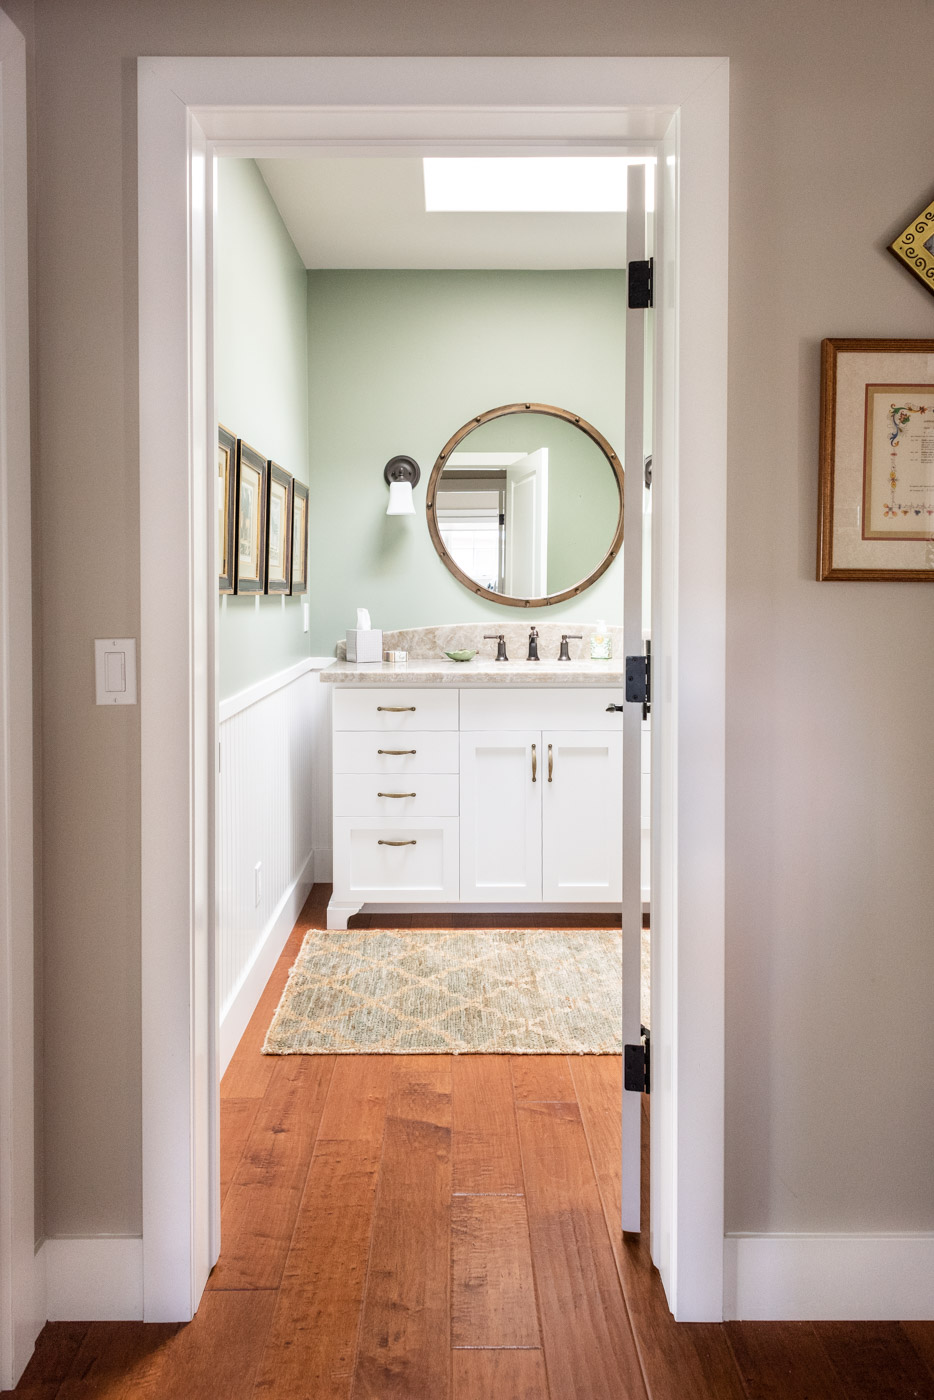 Coastal Craftsman home with custom white painted bathroom vanity cabinets